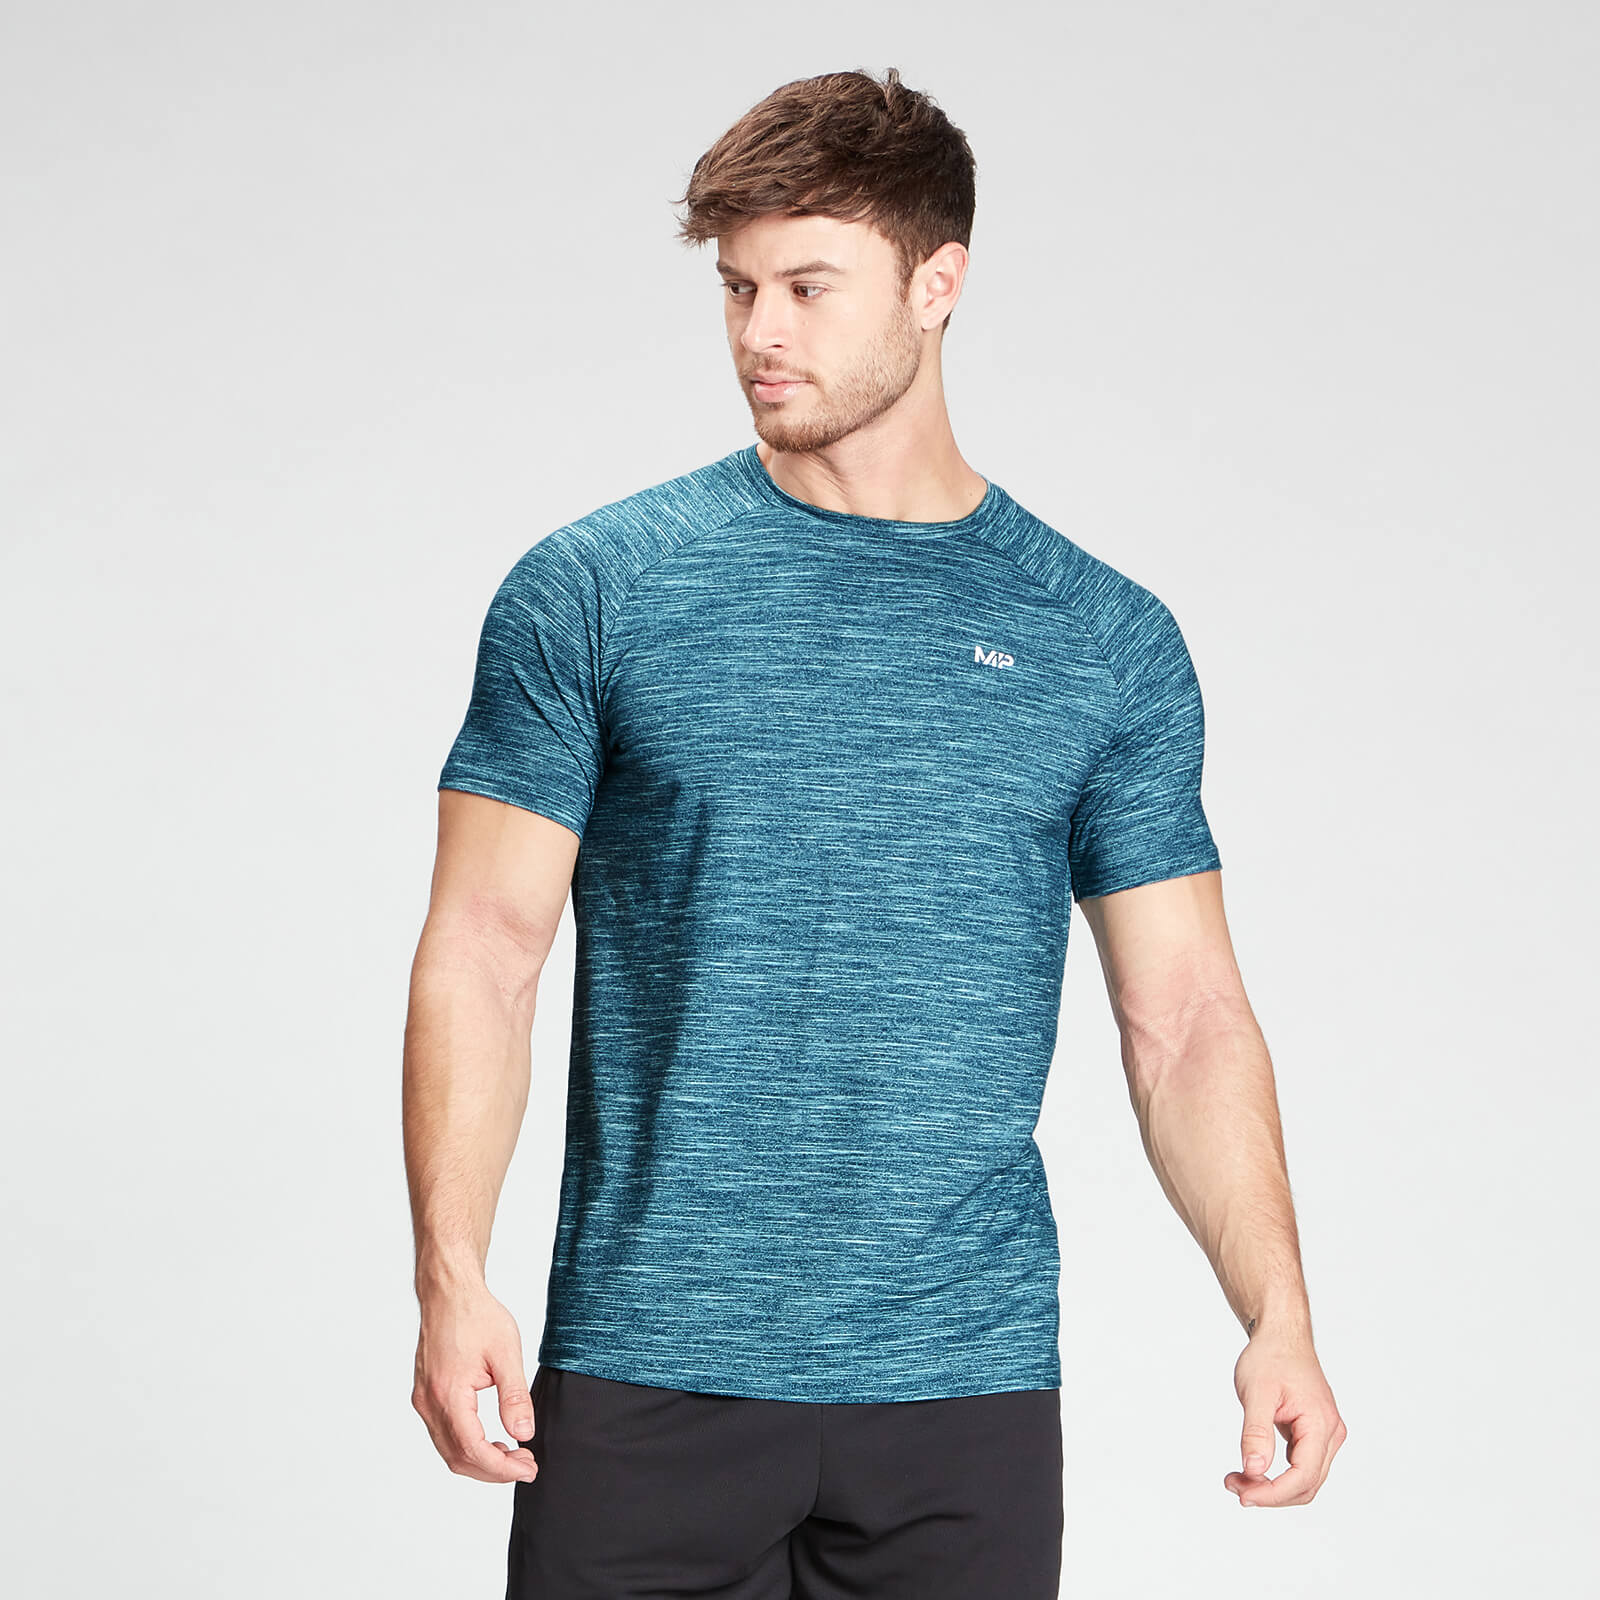 MP Men's Performance Short Sleeve T-Shirt - Deep Lake Marl - S